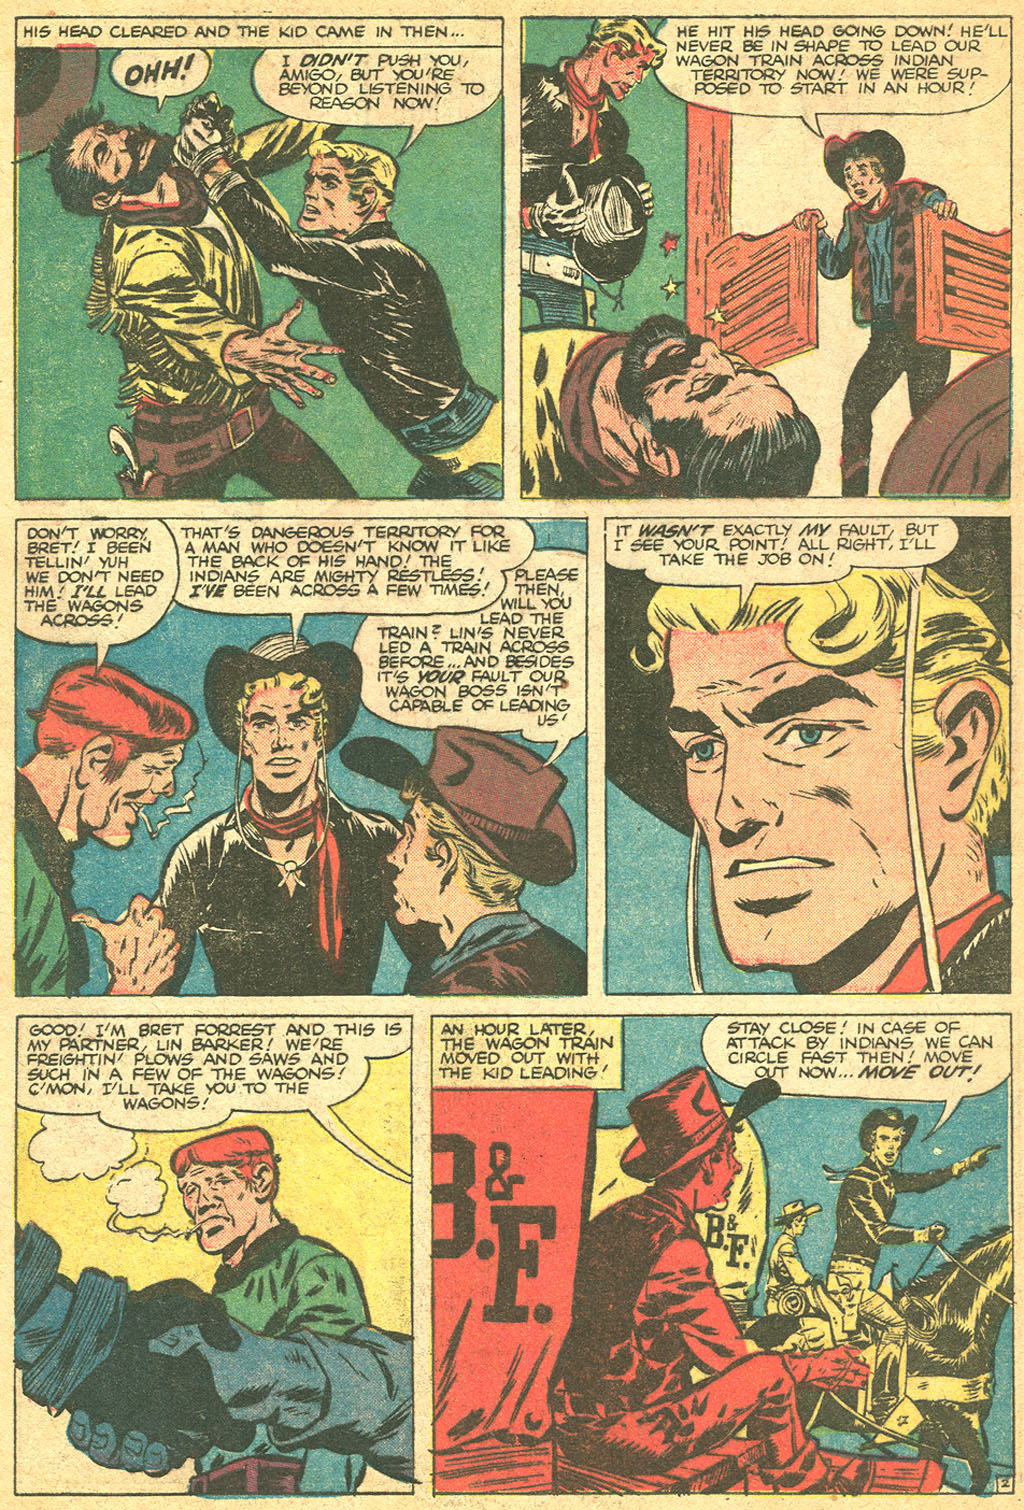 Read online Two-Gun Kid comic -  Issue #37 - 4